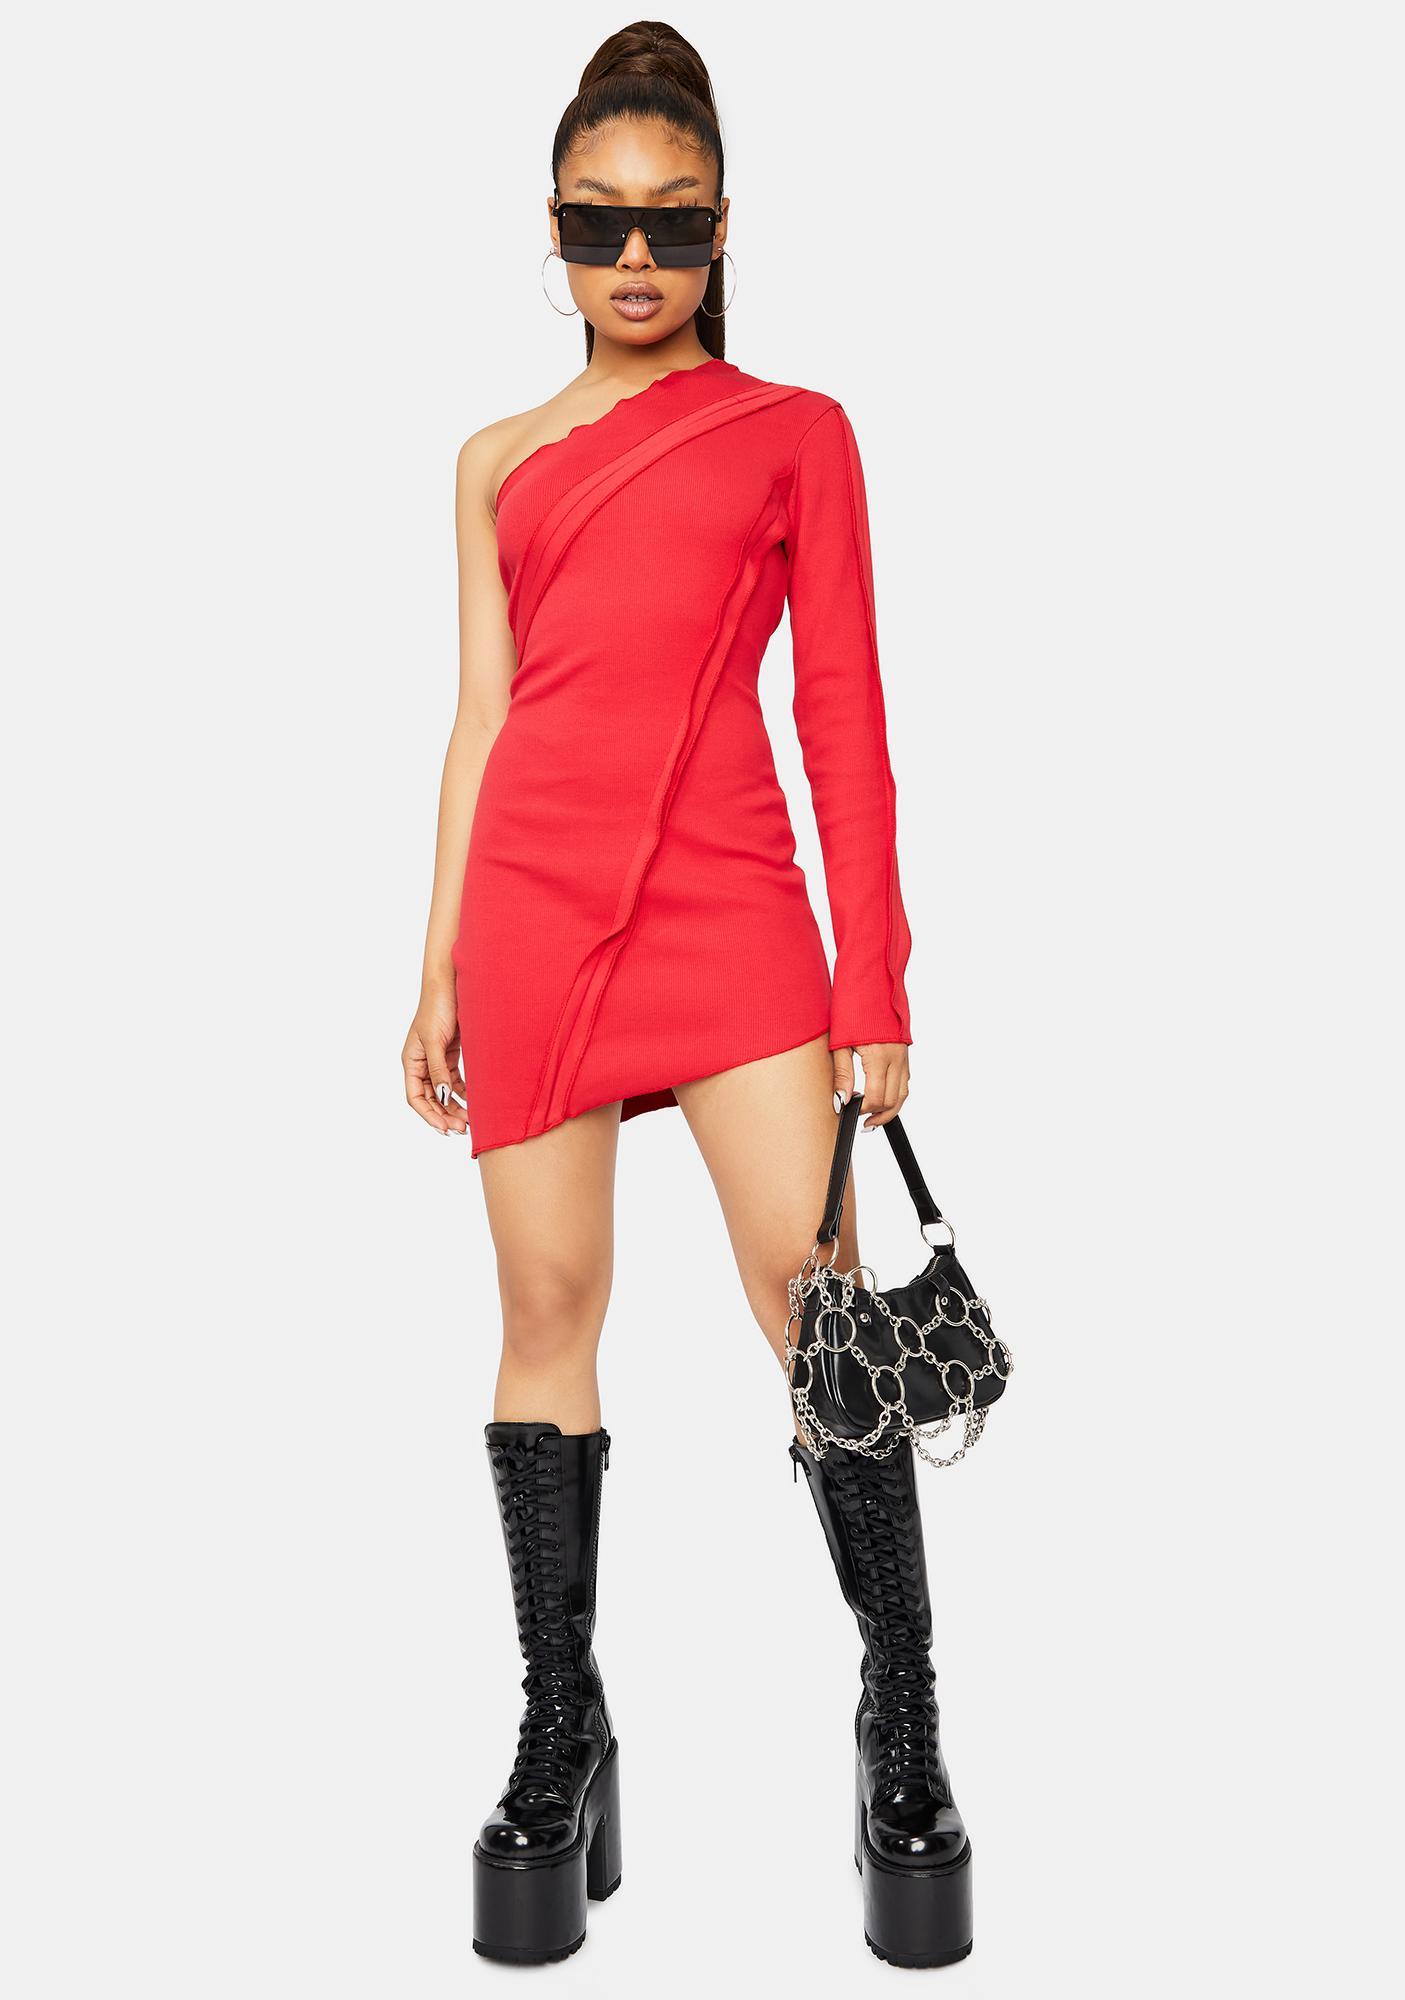 Scarlet New Adventures One Shoulder Mini Dress